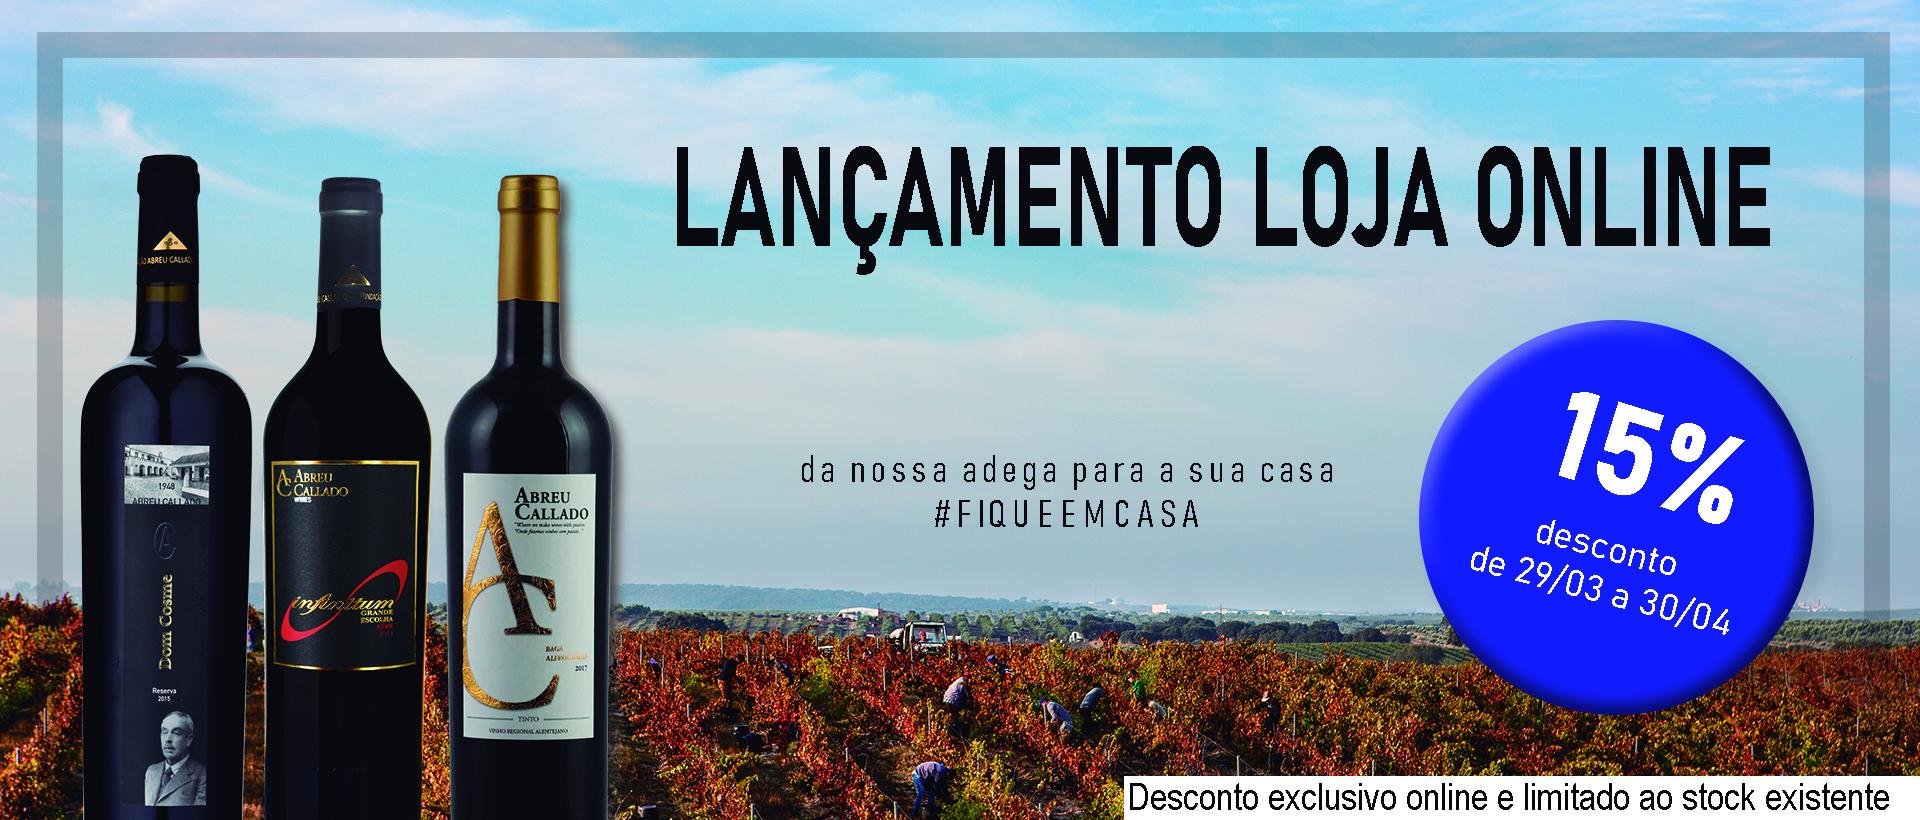 Lanamento_Loja_Onlinefinal